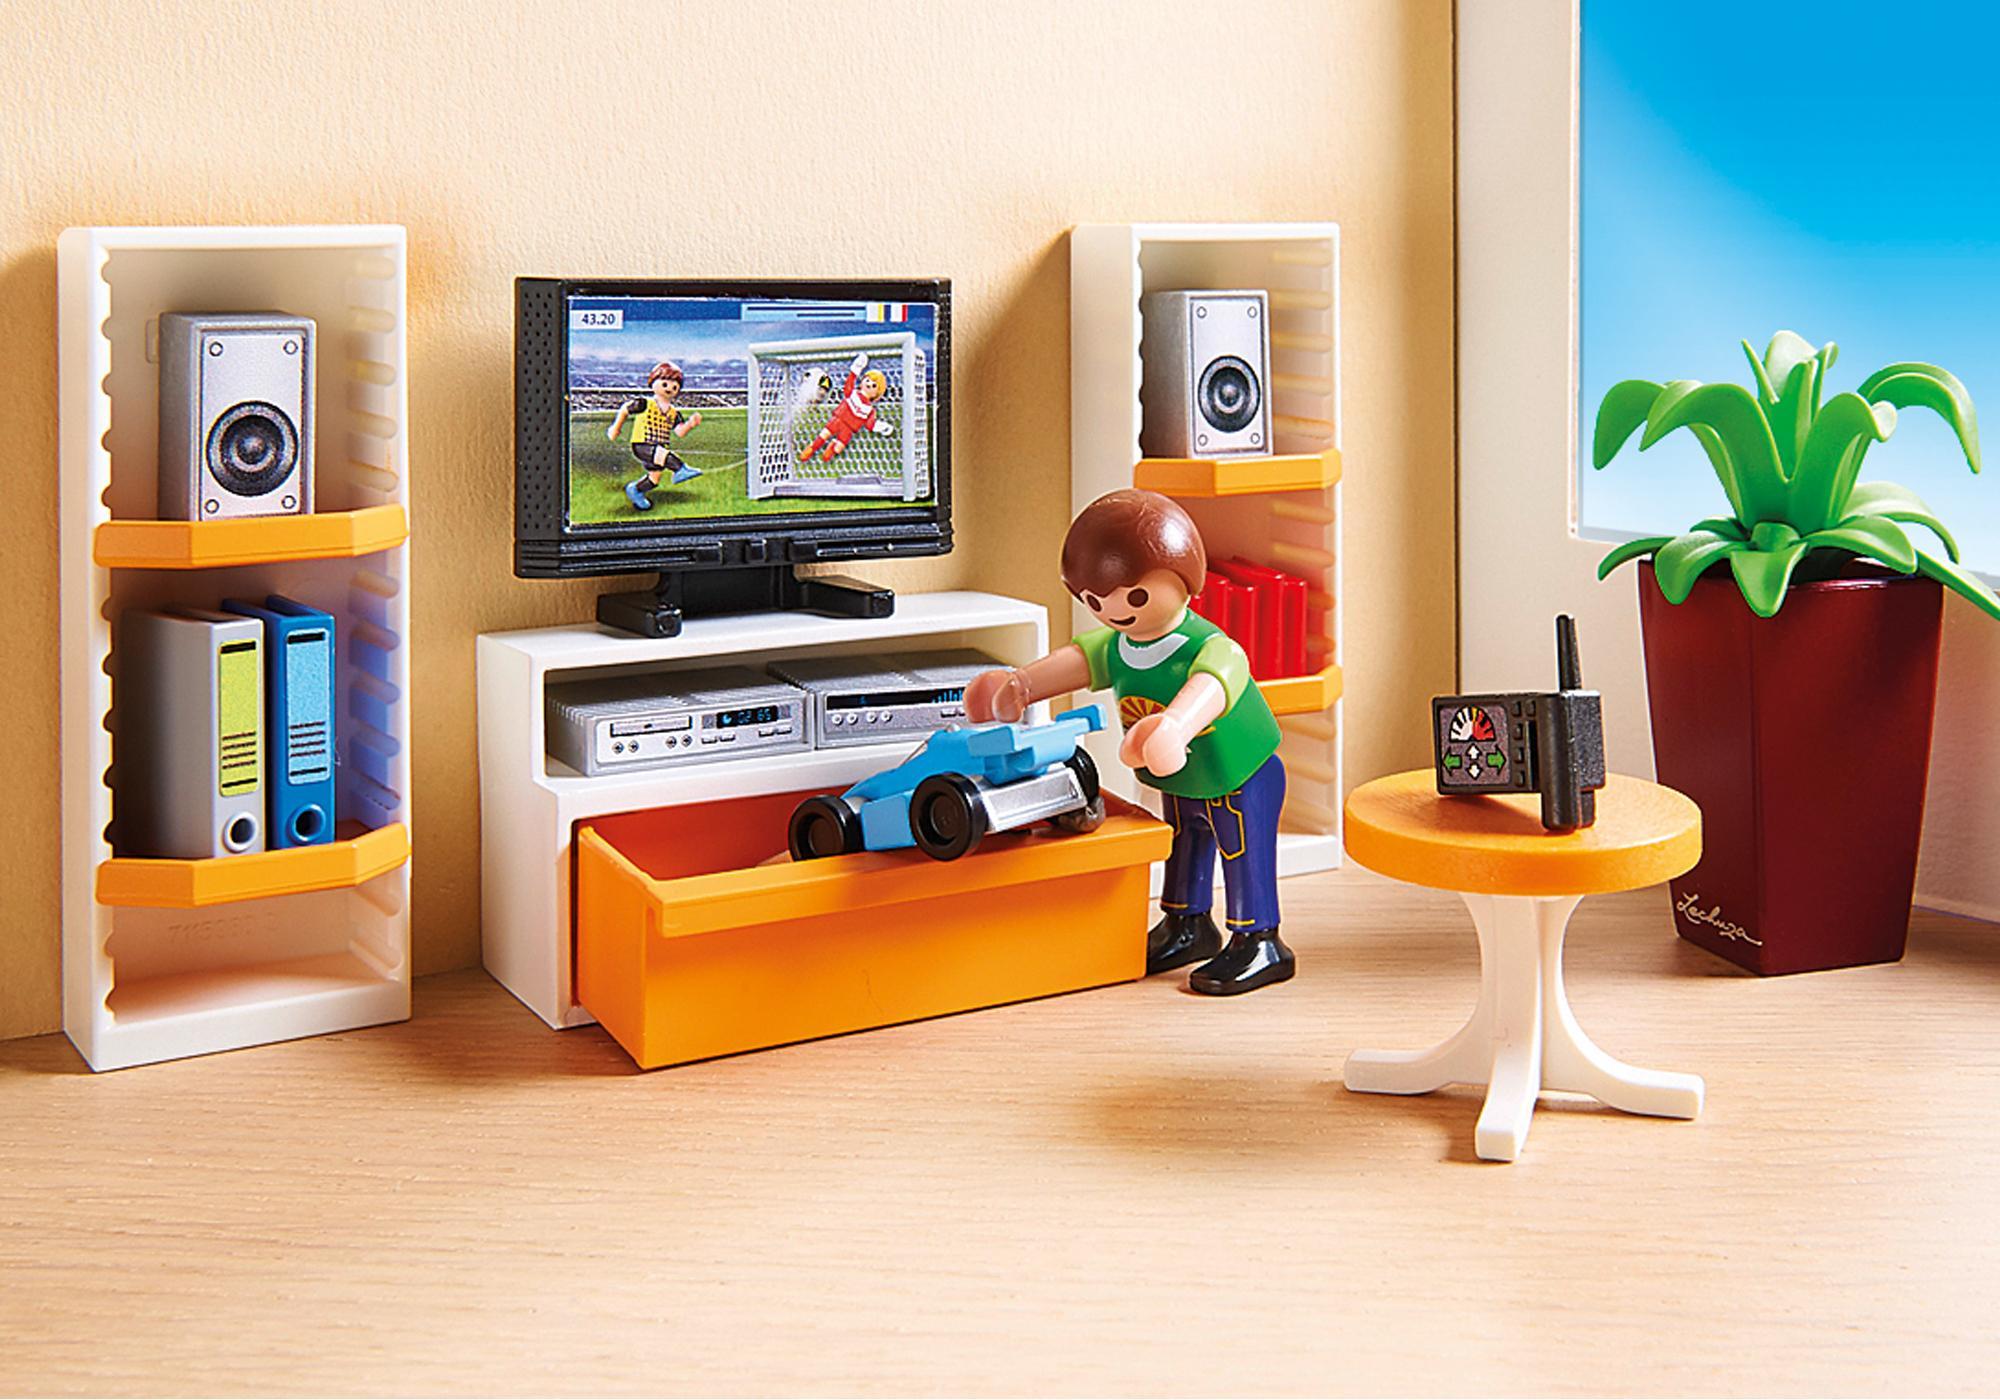 http://media.playmobil.com/i/playmobil/9267_product_extra2/Wohnzimmer